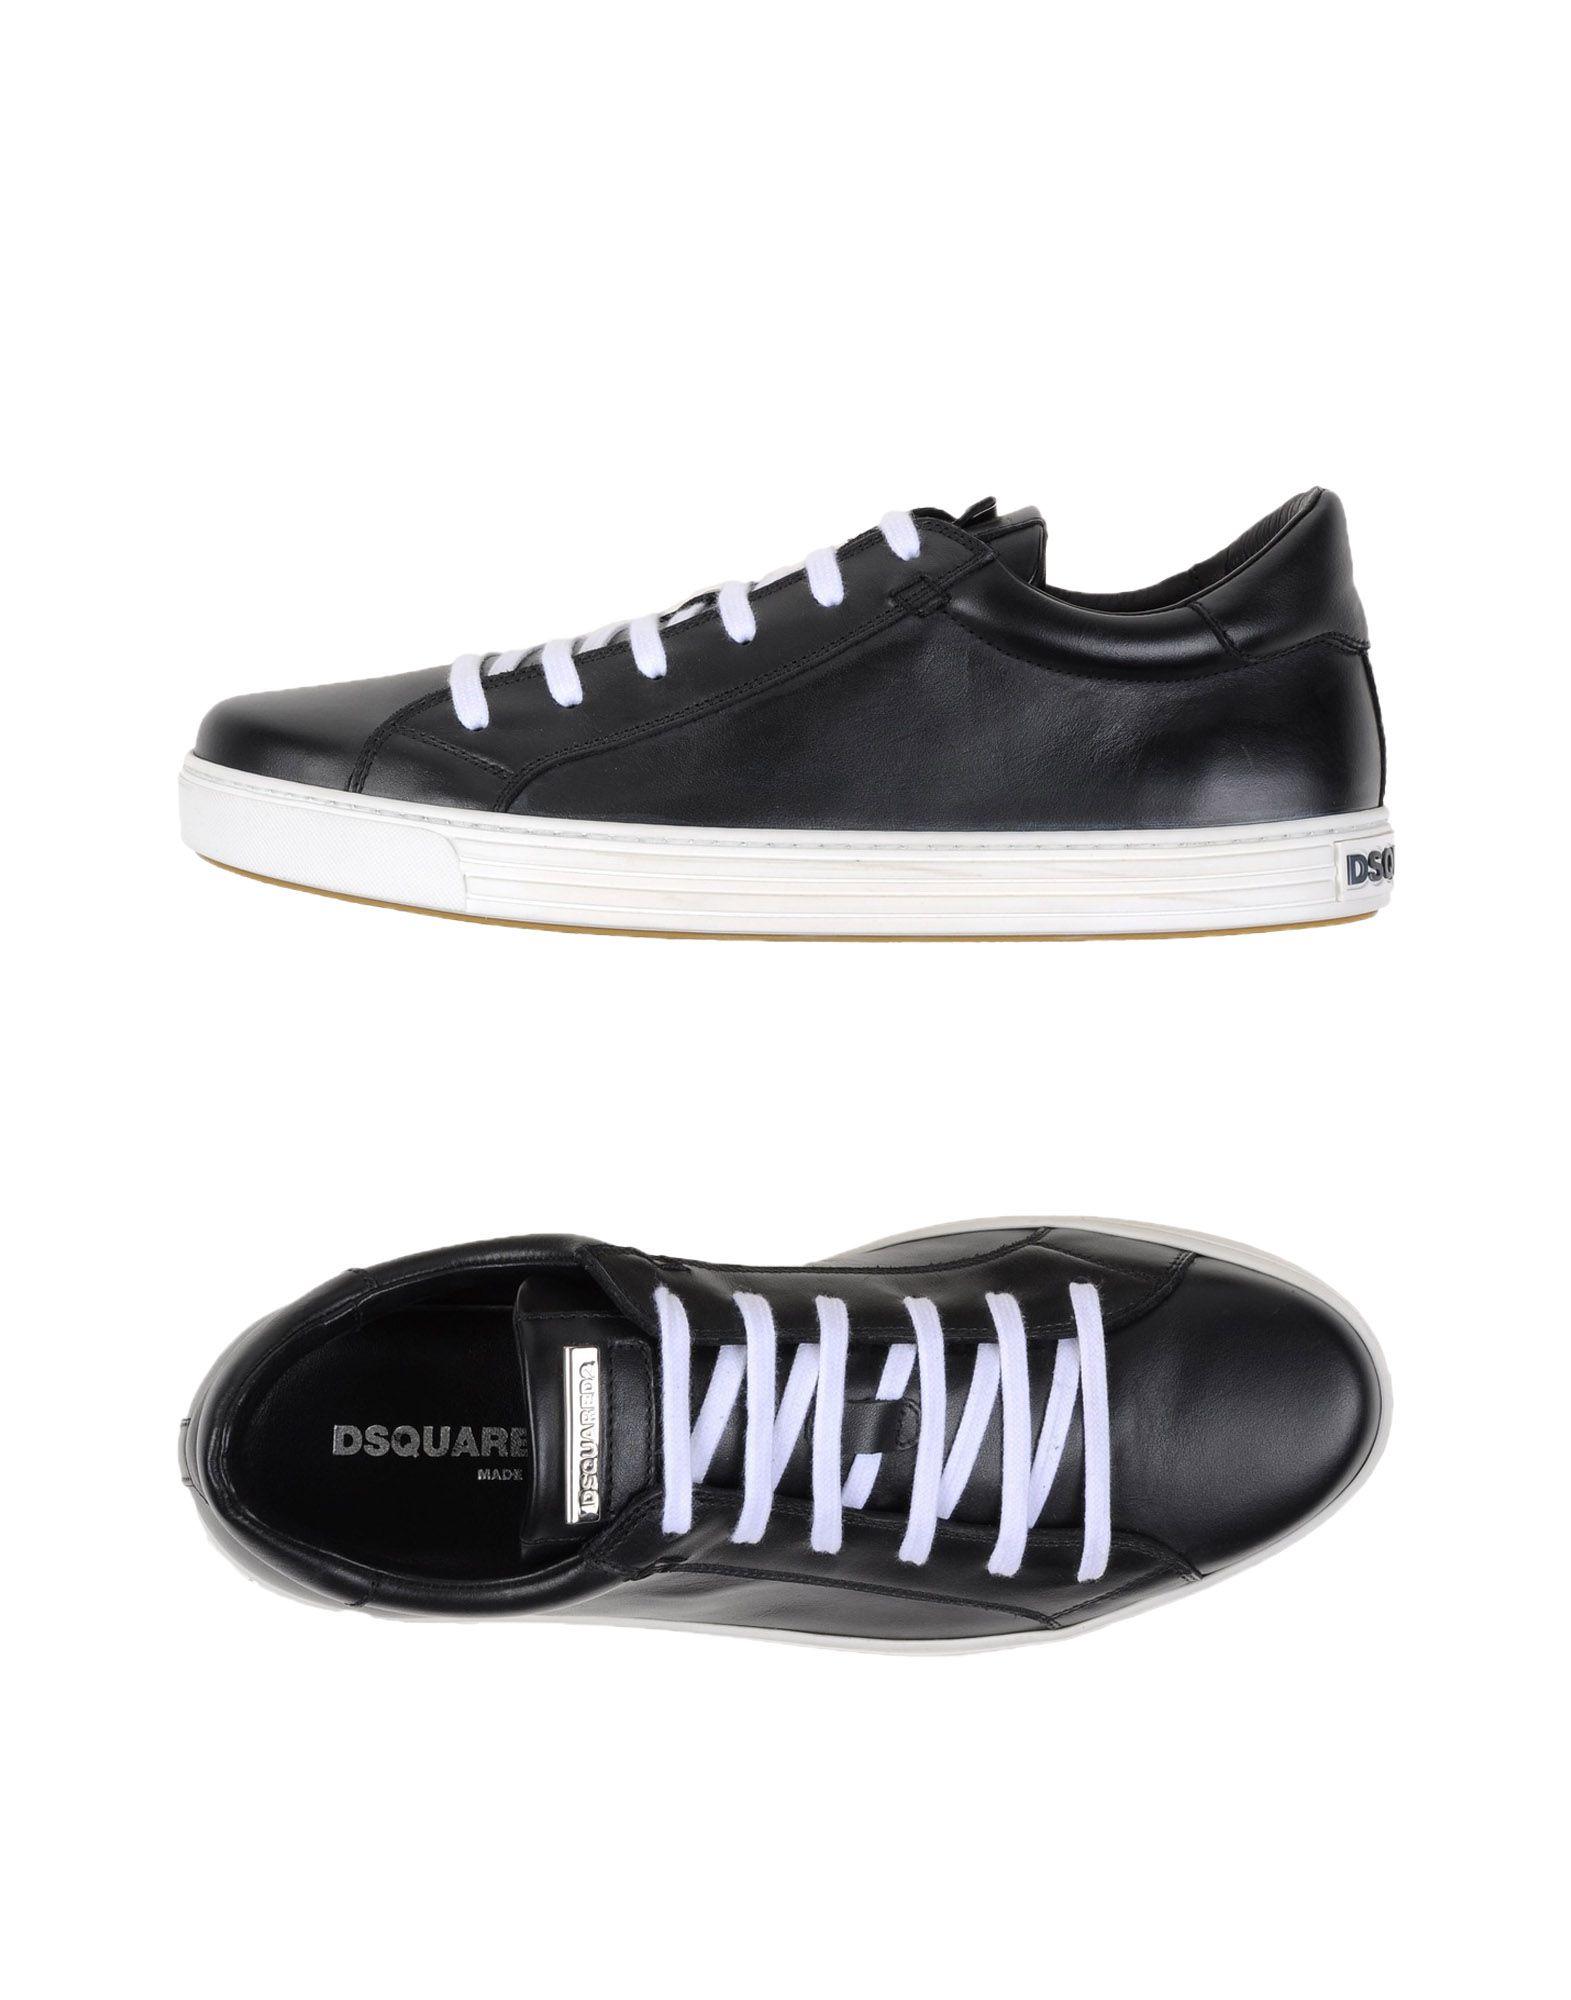 Dsquared2 Sneakers Herren  beliebte 11119822QV Gute Qualität beliebte  Schuhe bd1319